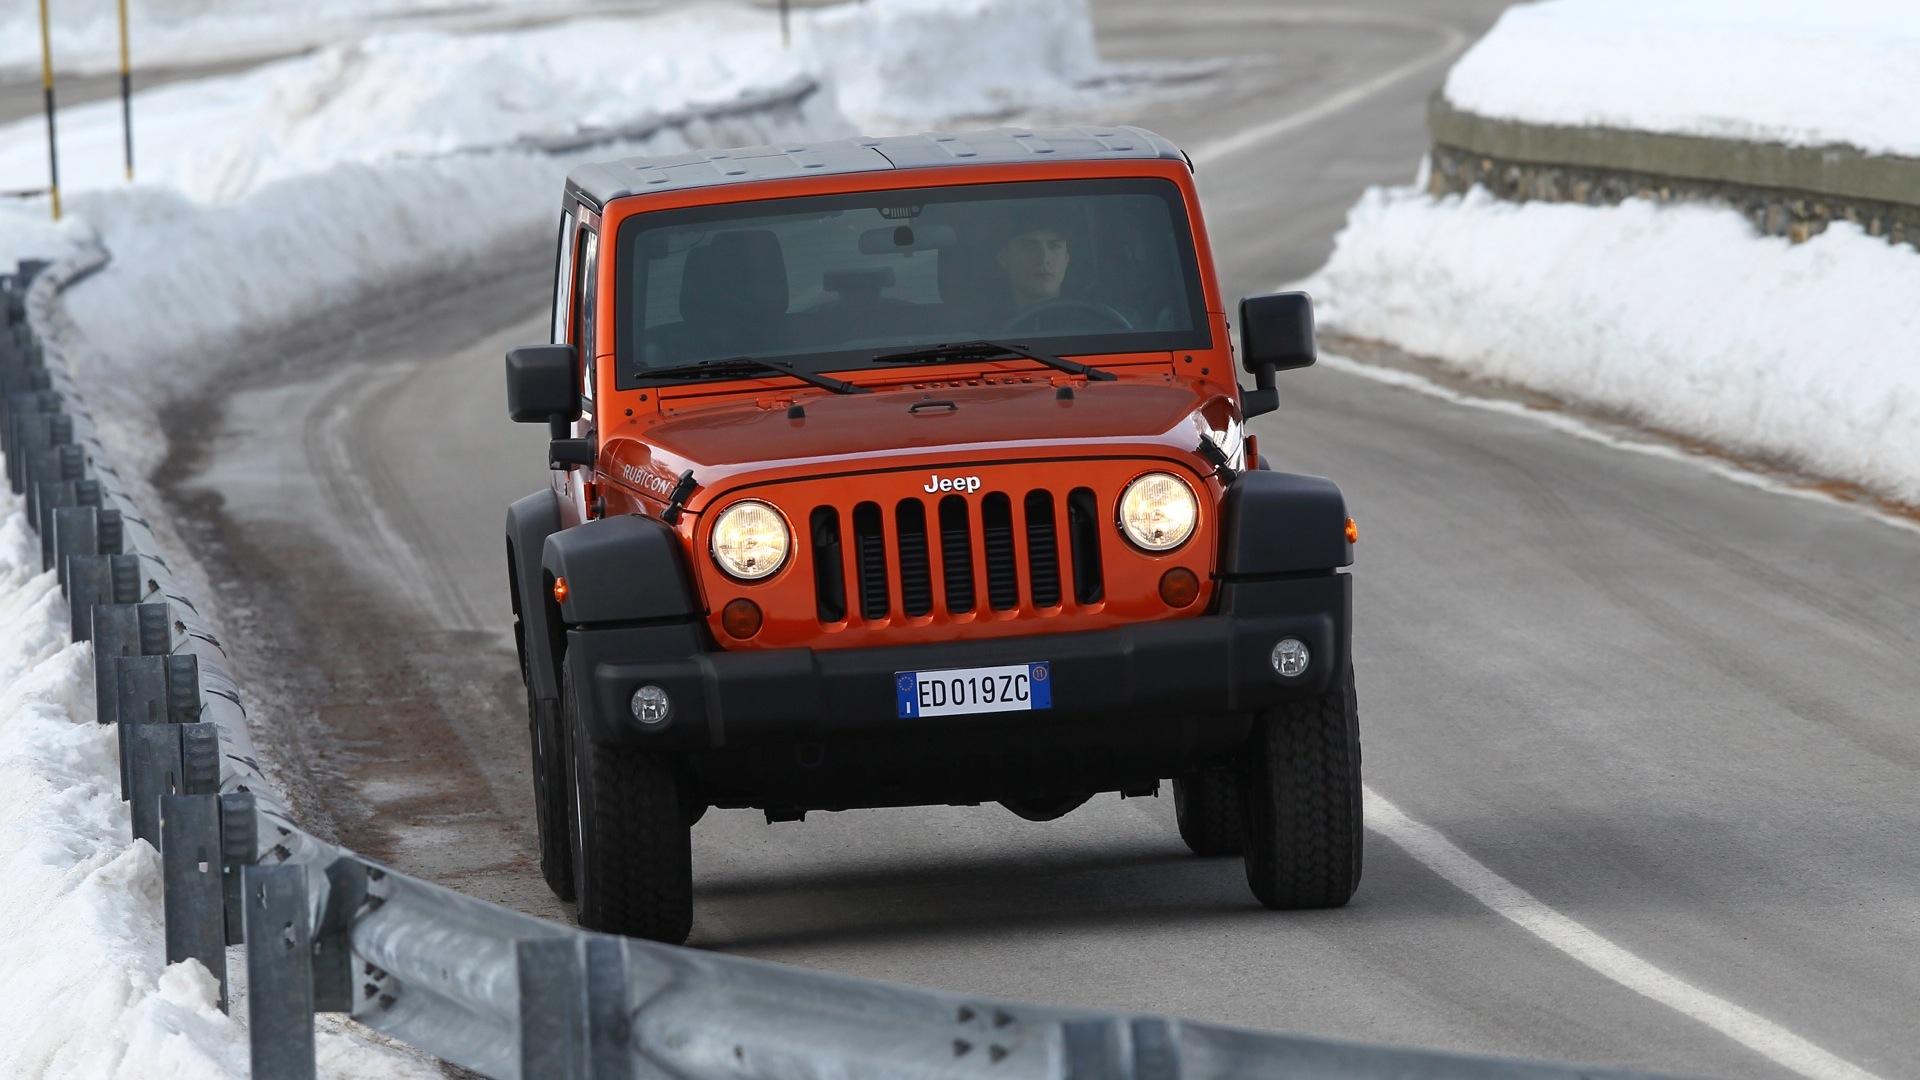 Jeep Wrangler 2013 STD